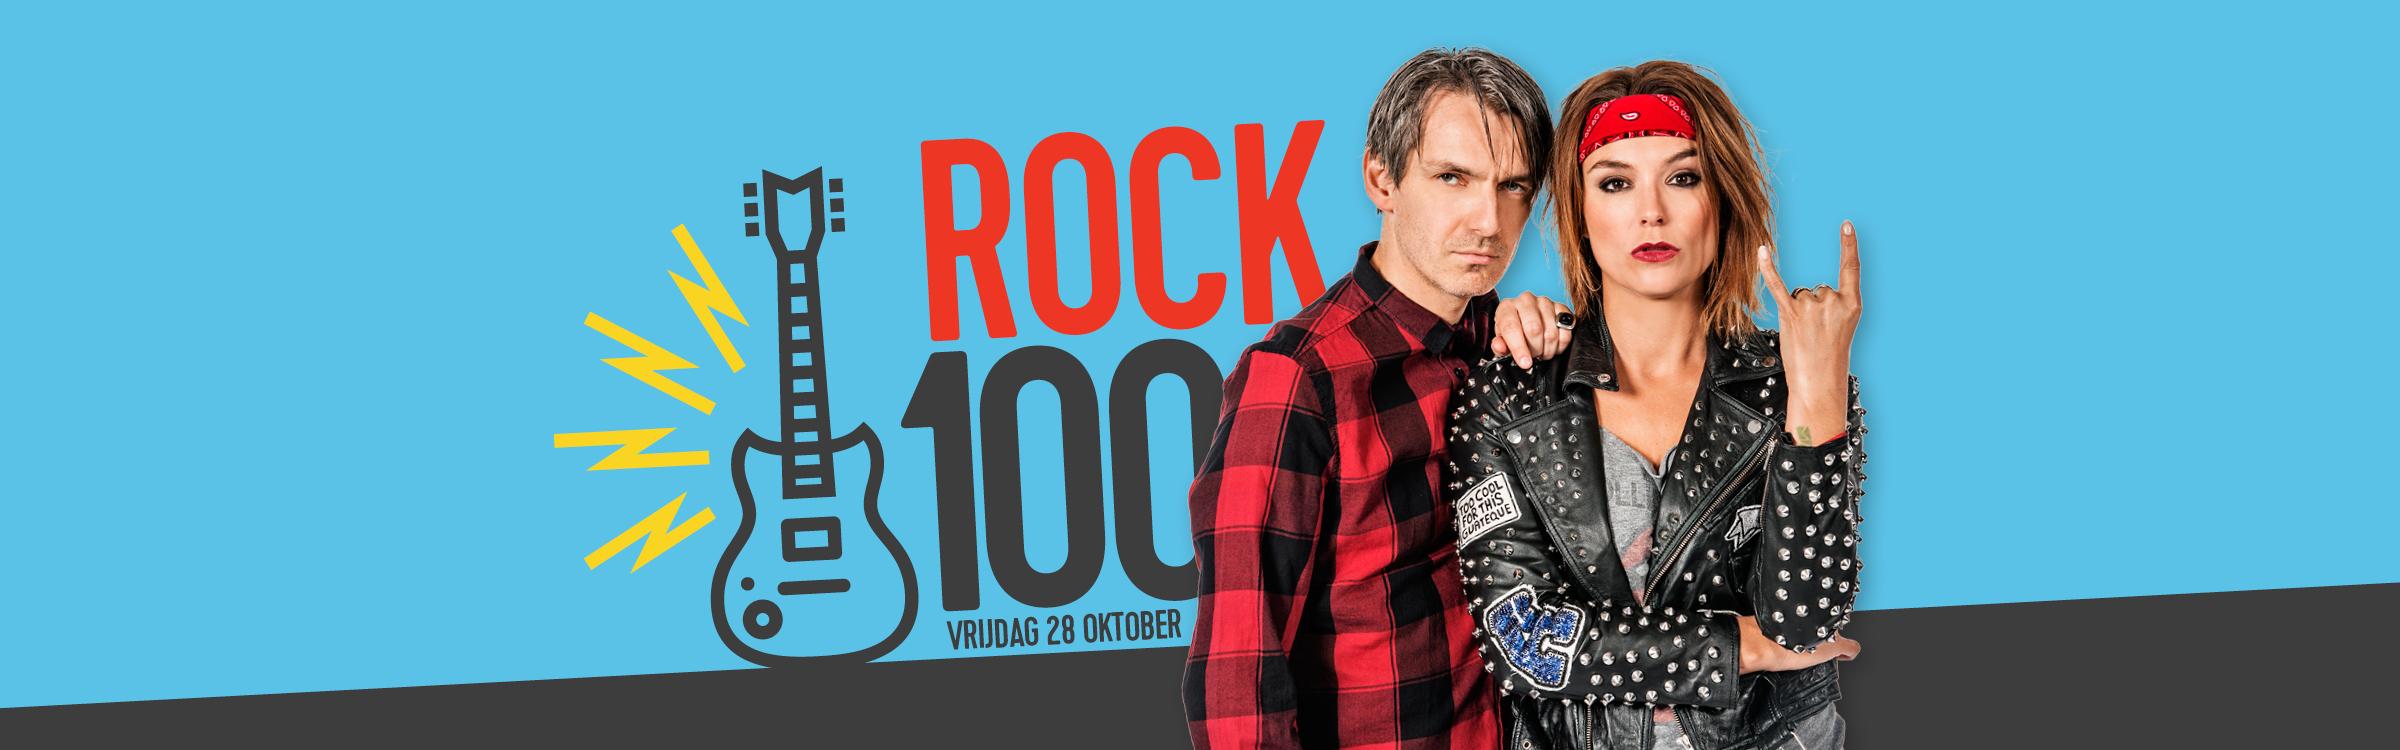 Q rock100 header 1350x750